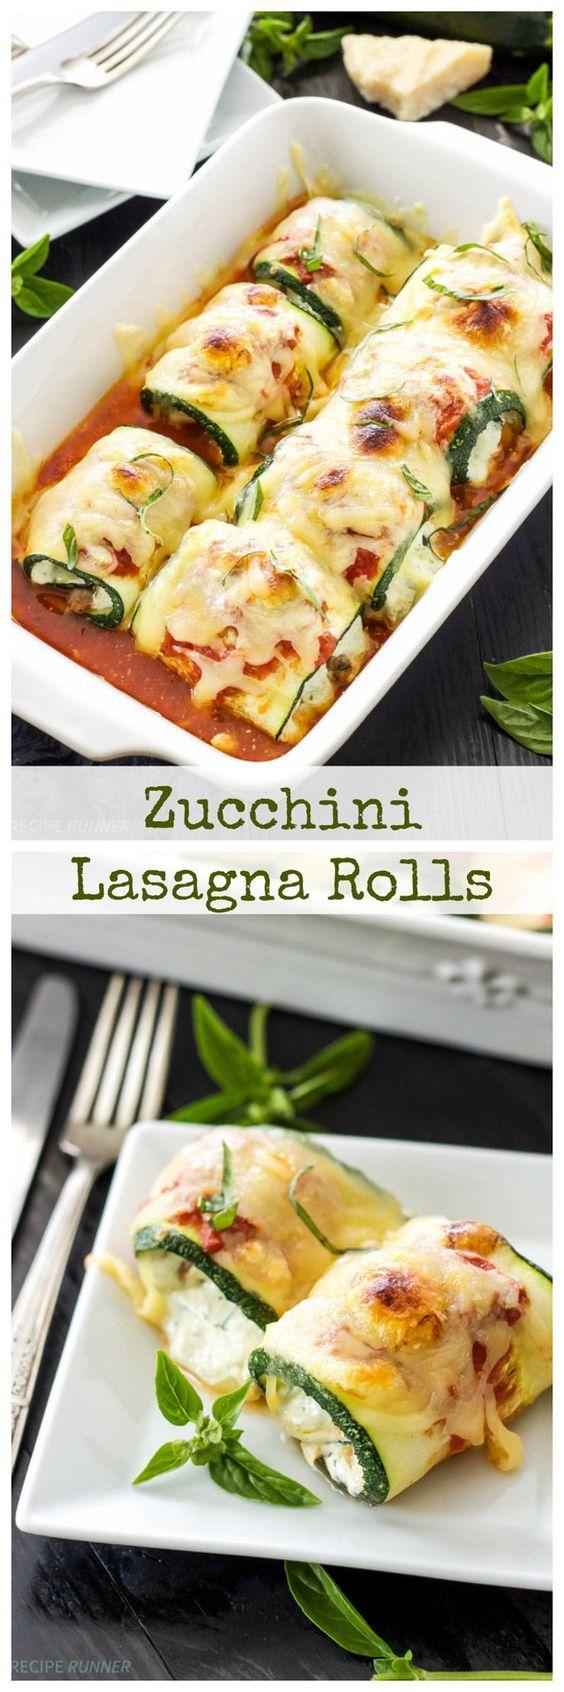 Zucchini Lasagna Rolls   Use zucchini instead of pasta in this healthy, gluten free lasagna recipe!: